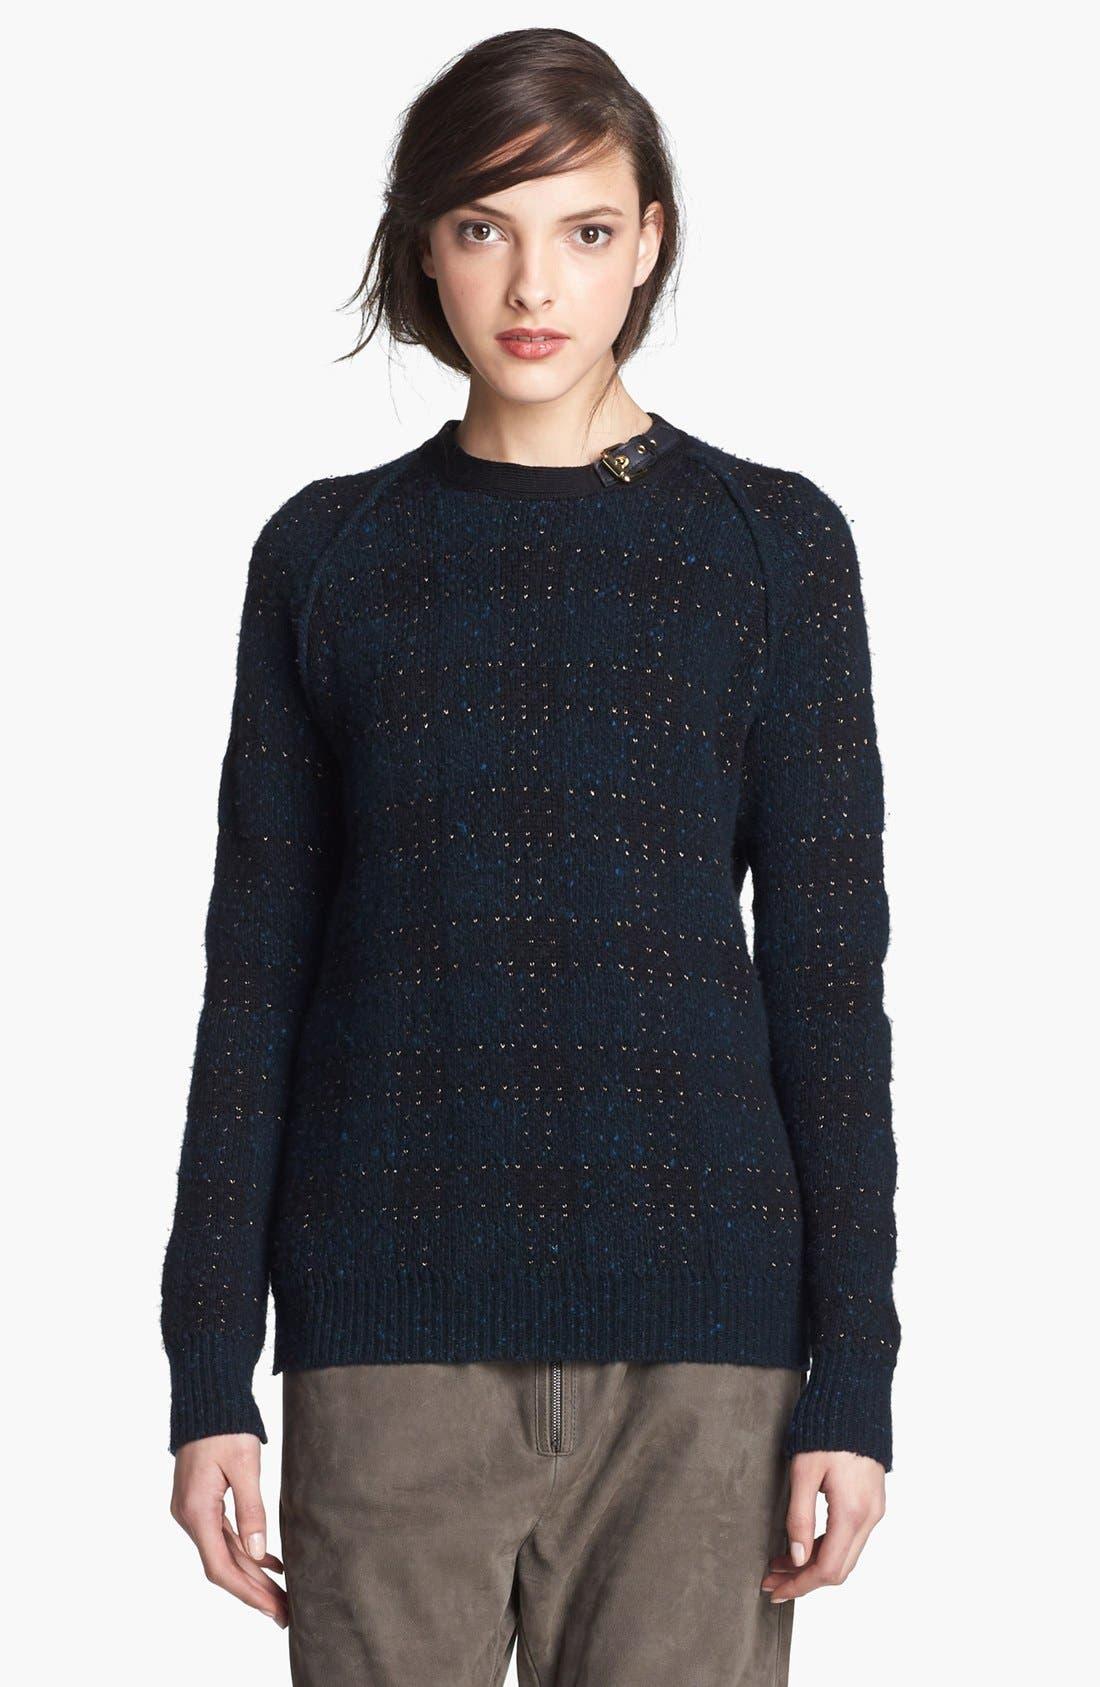 Alternate Image 1 Selected - 3.1 Phillip Lim Plaid Sweater